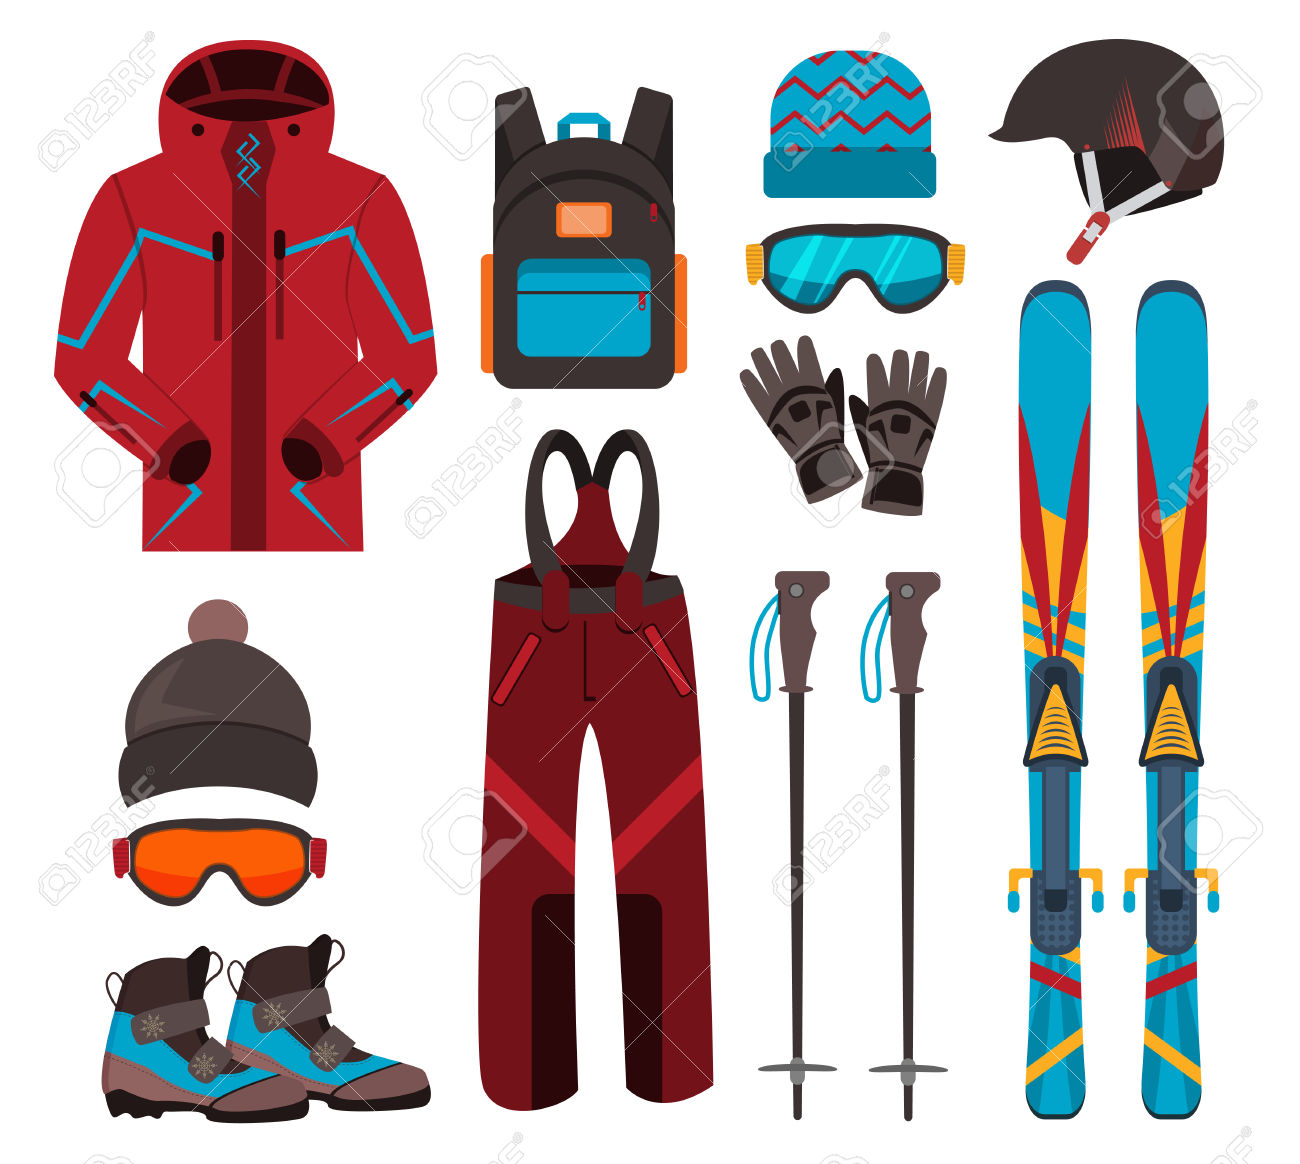 winter equipment clipart